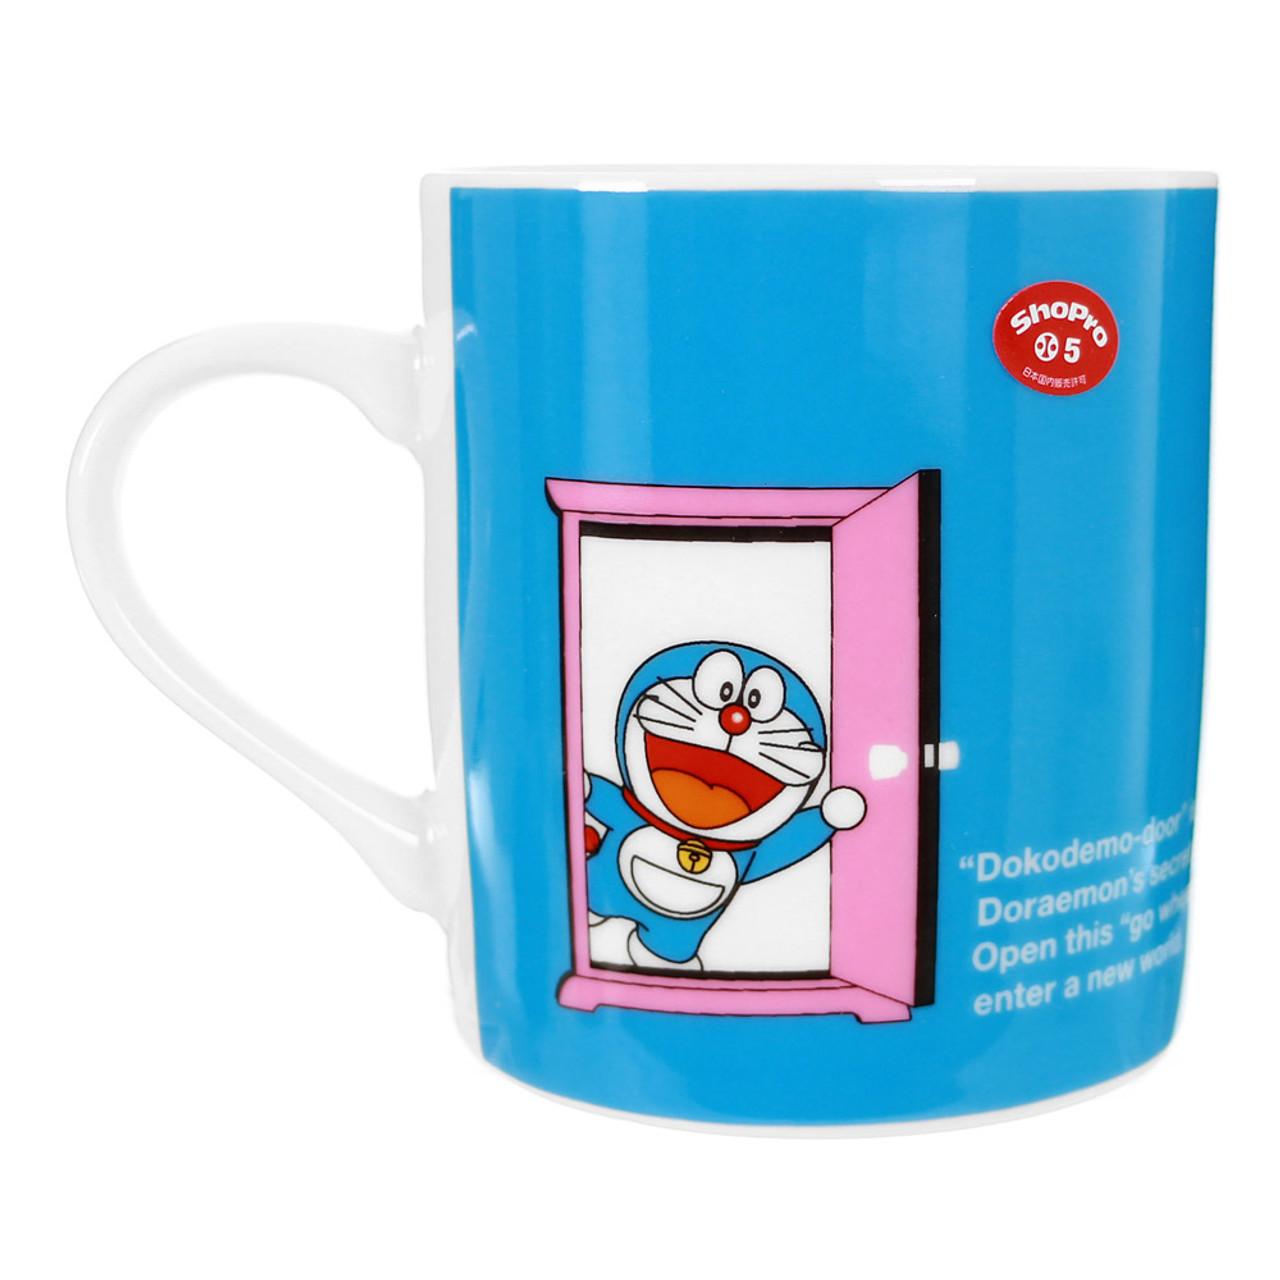 Doraemon Secret Pink Door Porcelain Cup ( Back View )